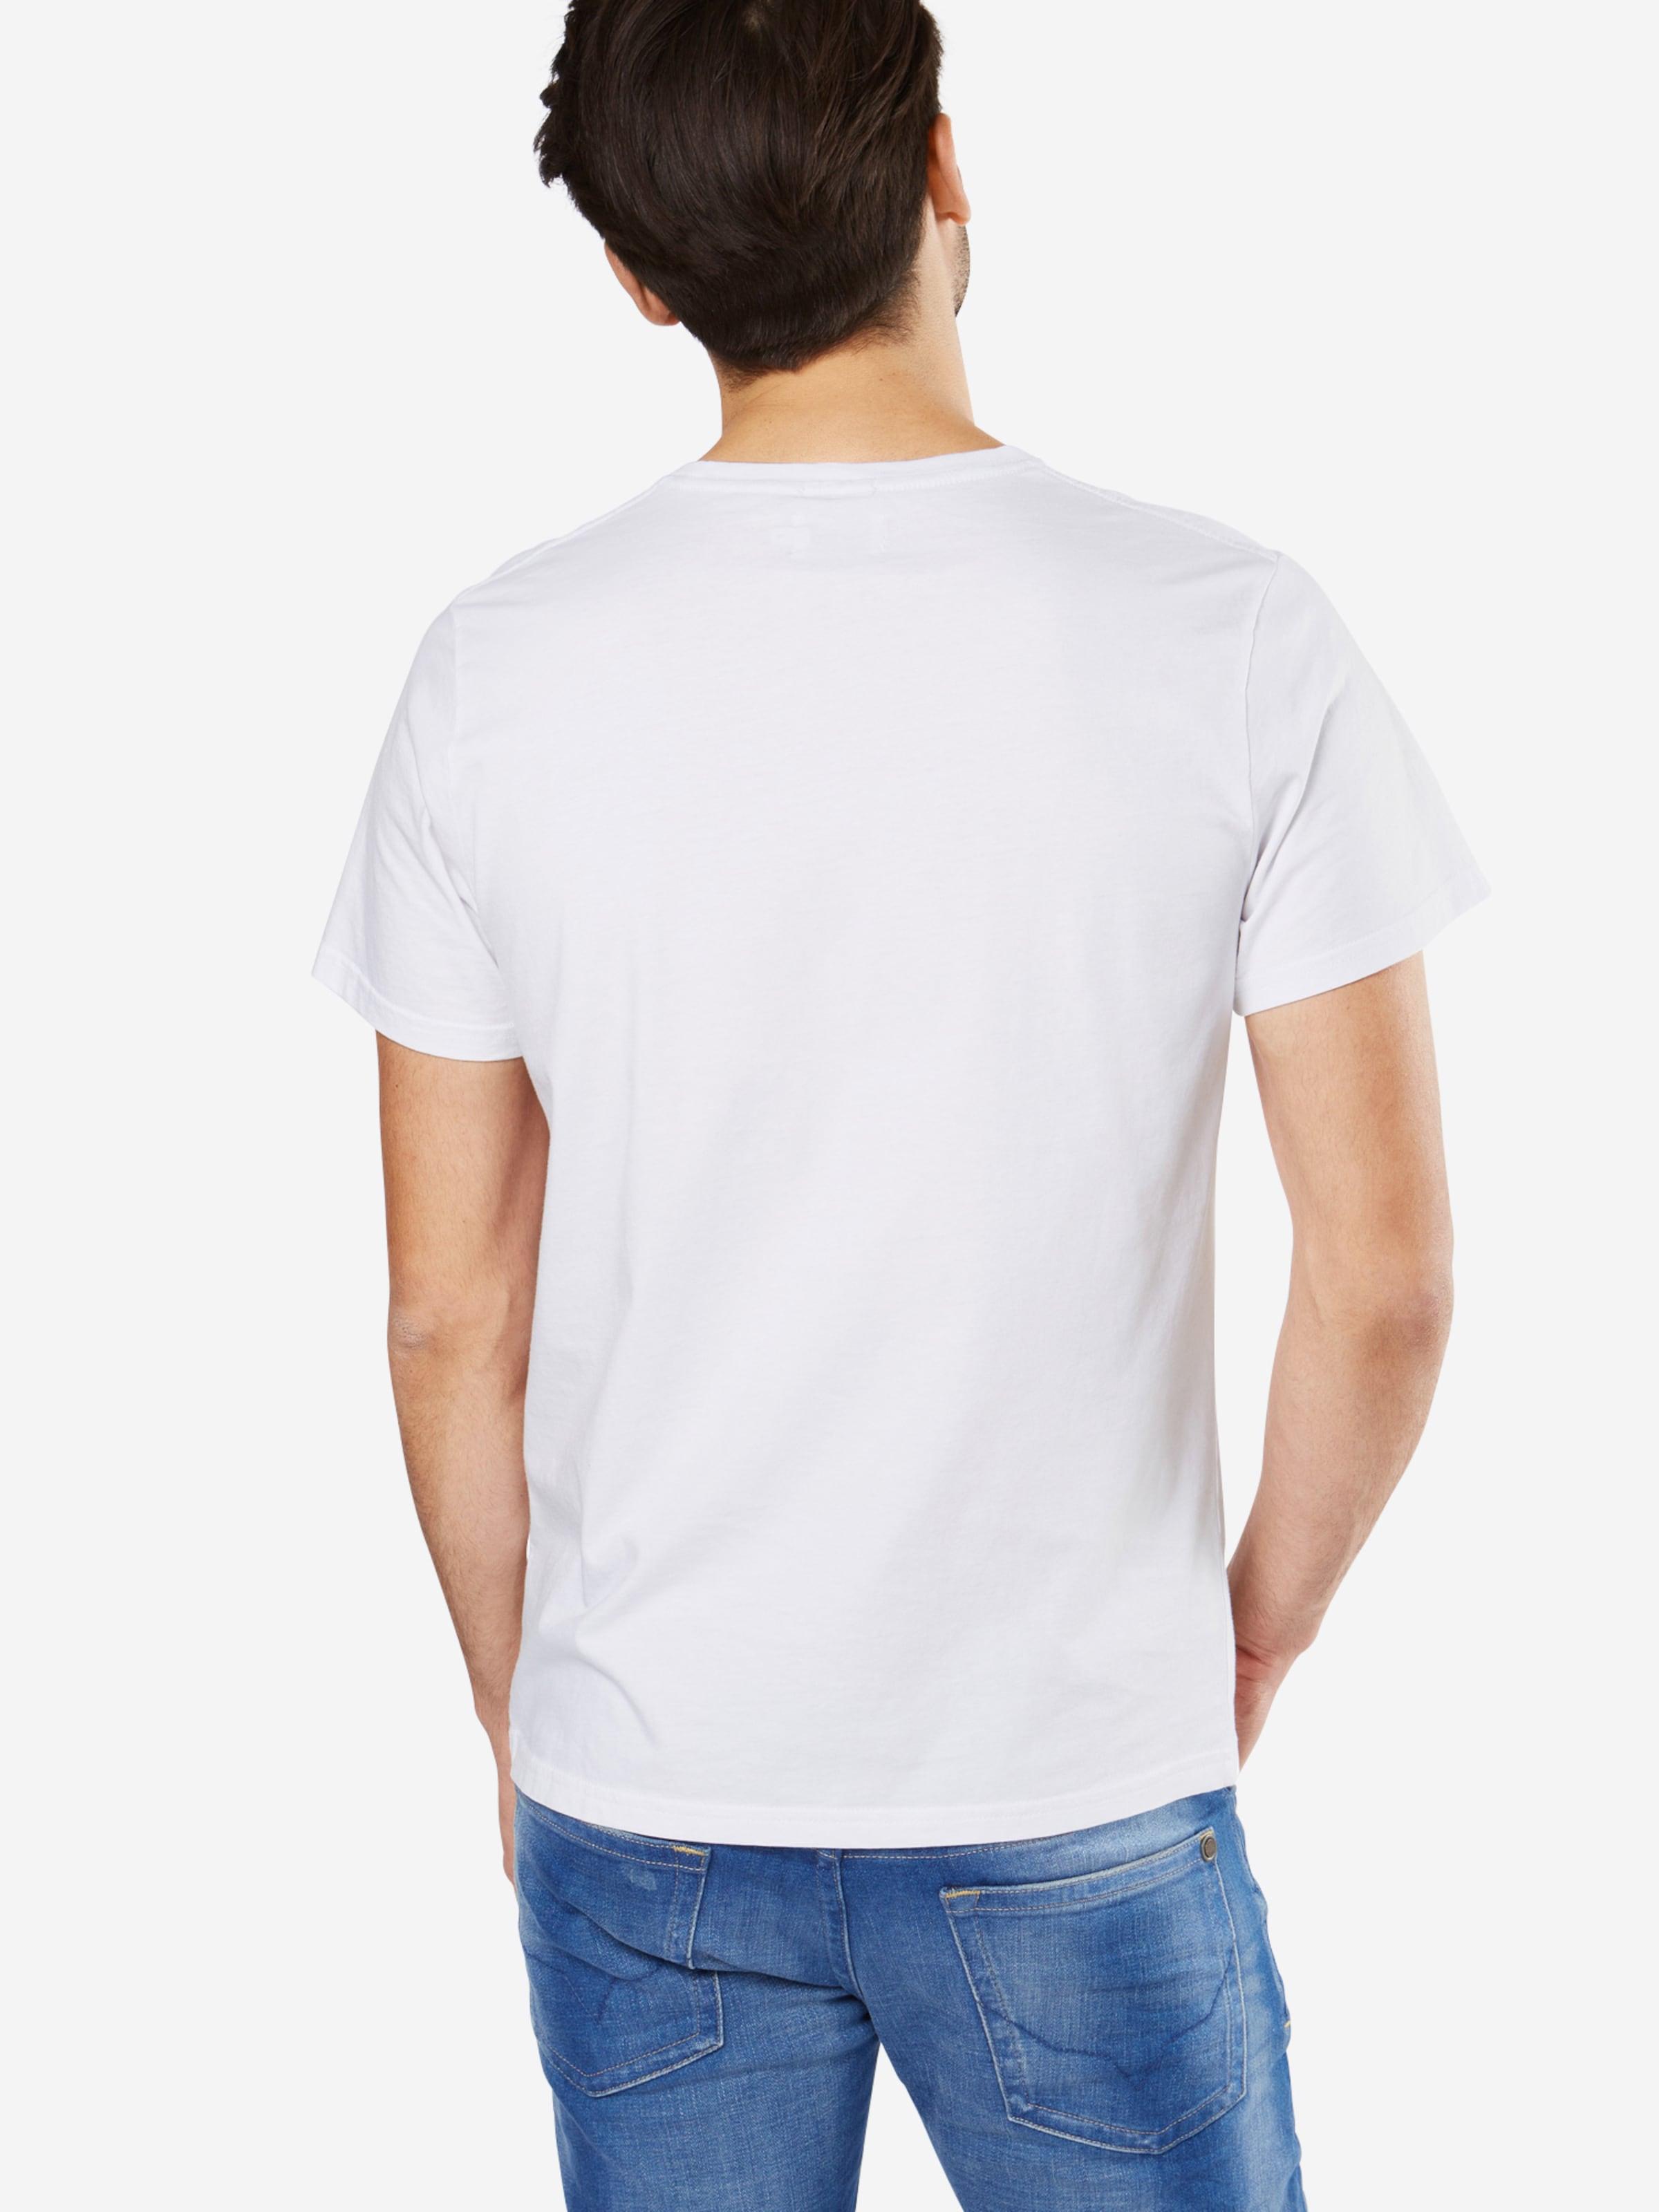 Pepe Jeans T-Shirt 'EGGO' Verkauf Bestseller Akpj5f